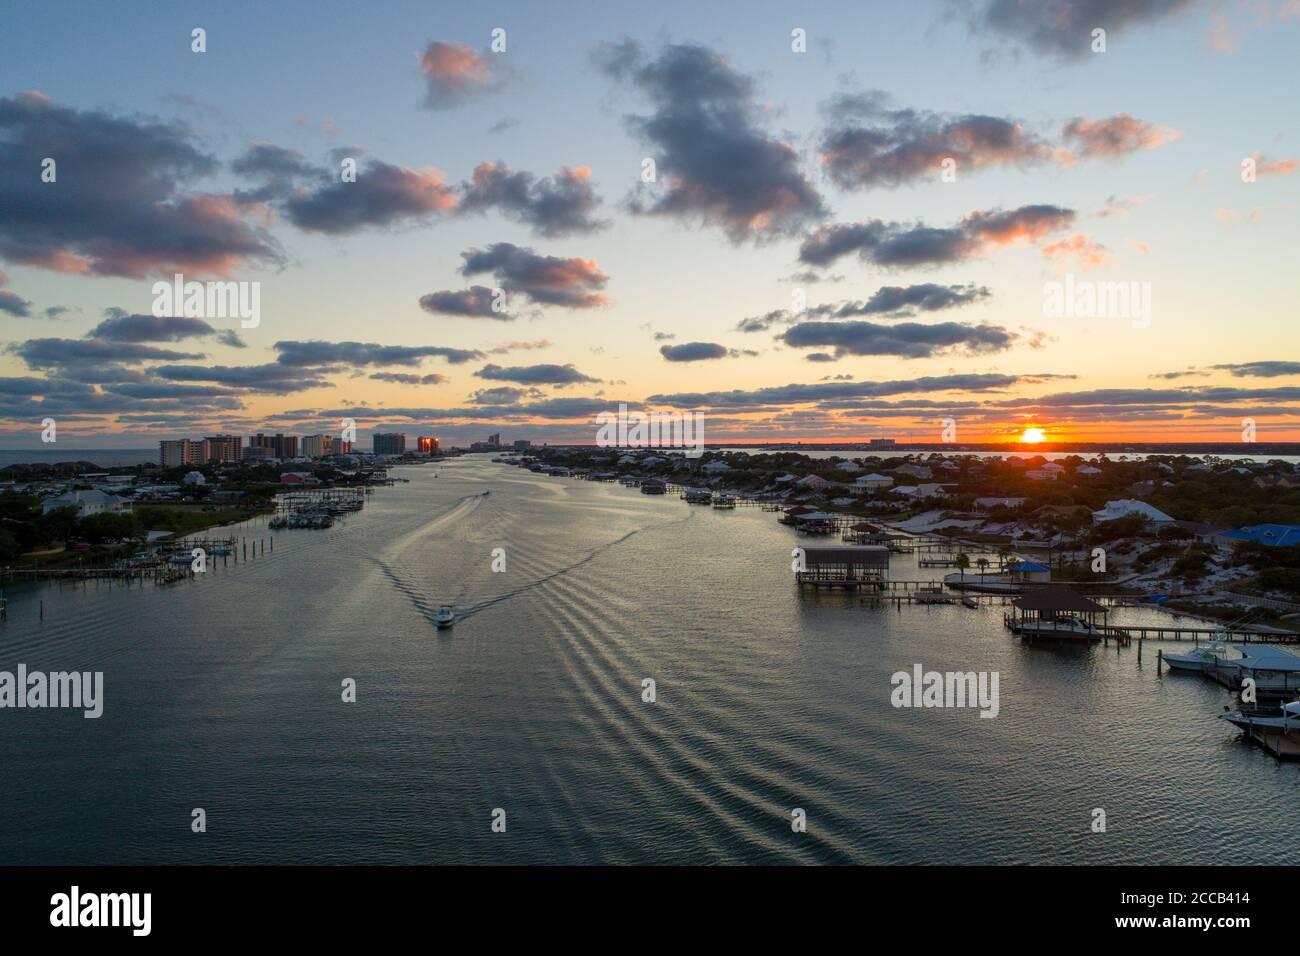 ONO Island e Perdido Key al tramonto Foto Stock